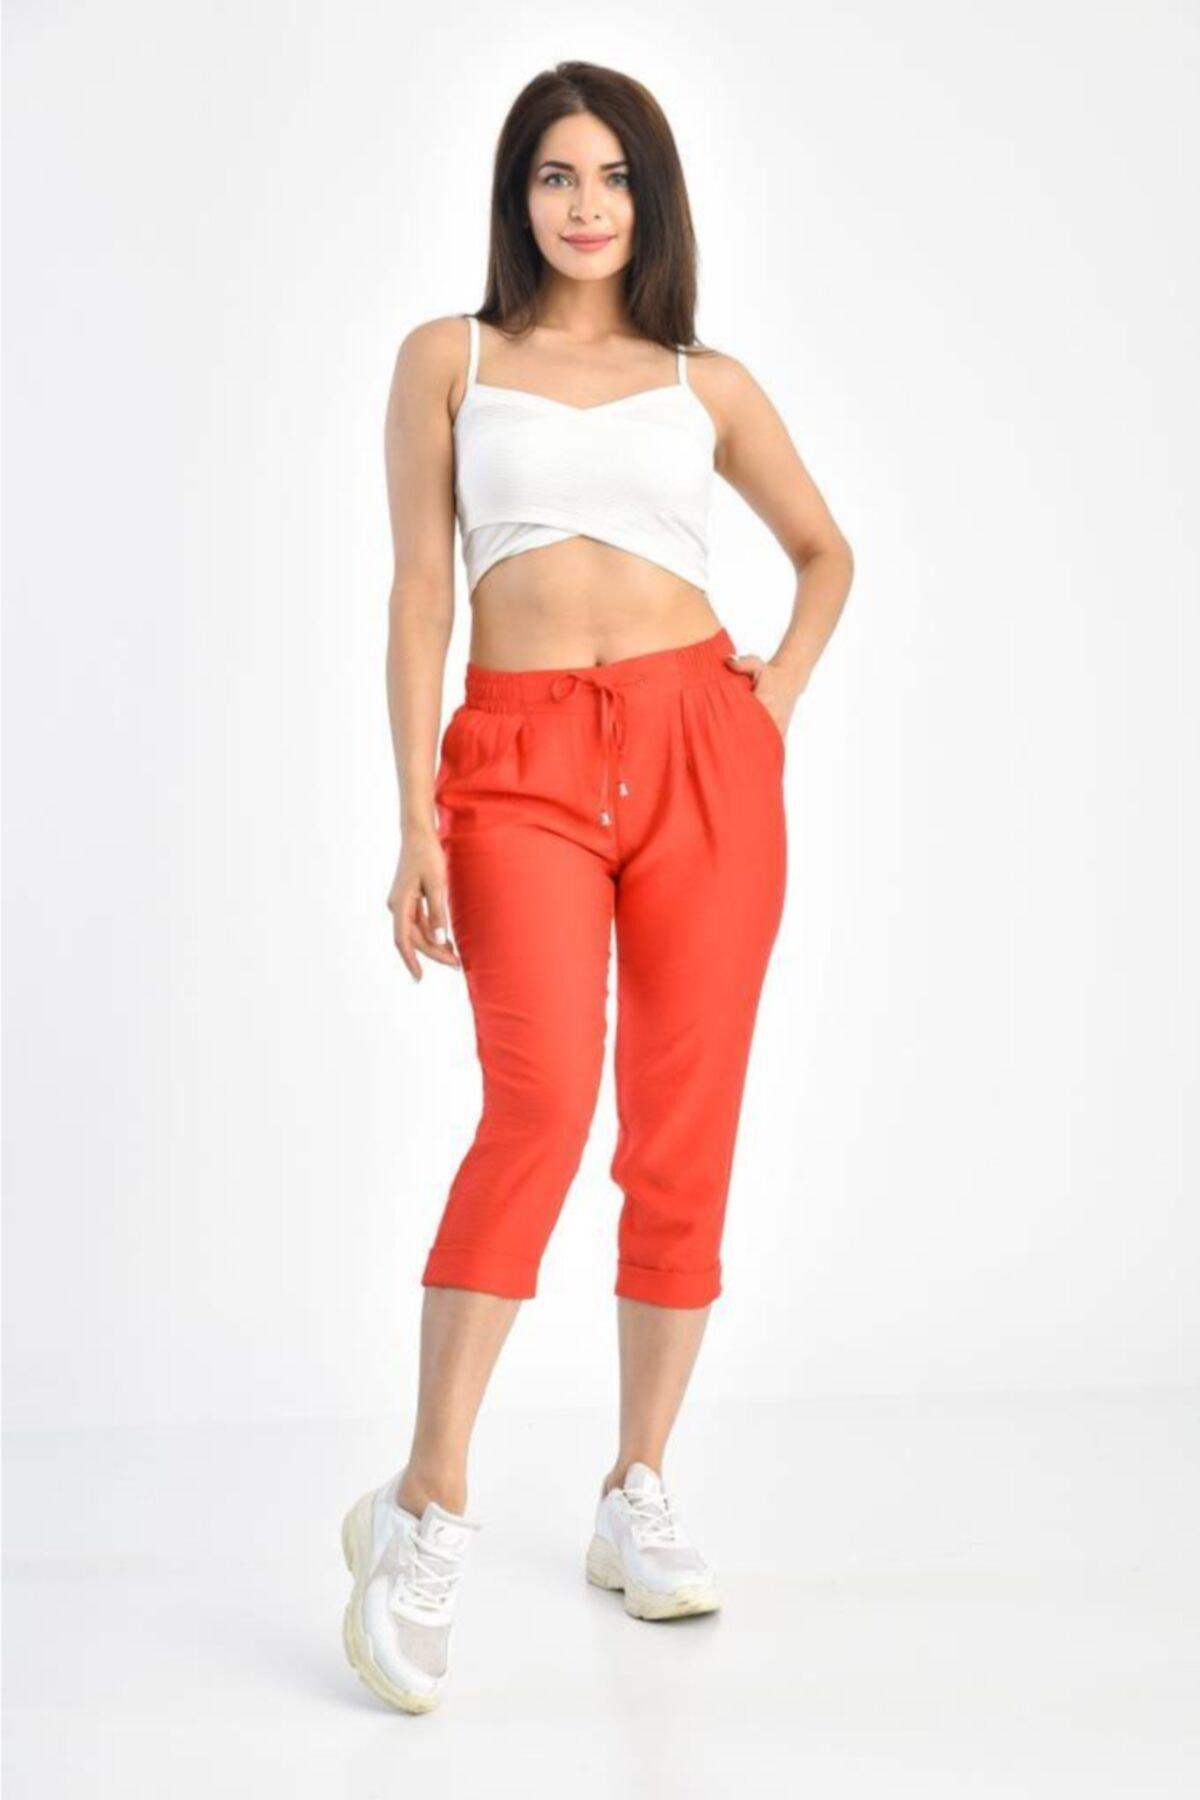 Modkofoni Kadın Belden Lastikli Fuşya Kapri Pantolon 1